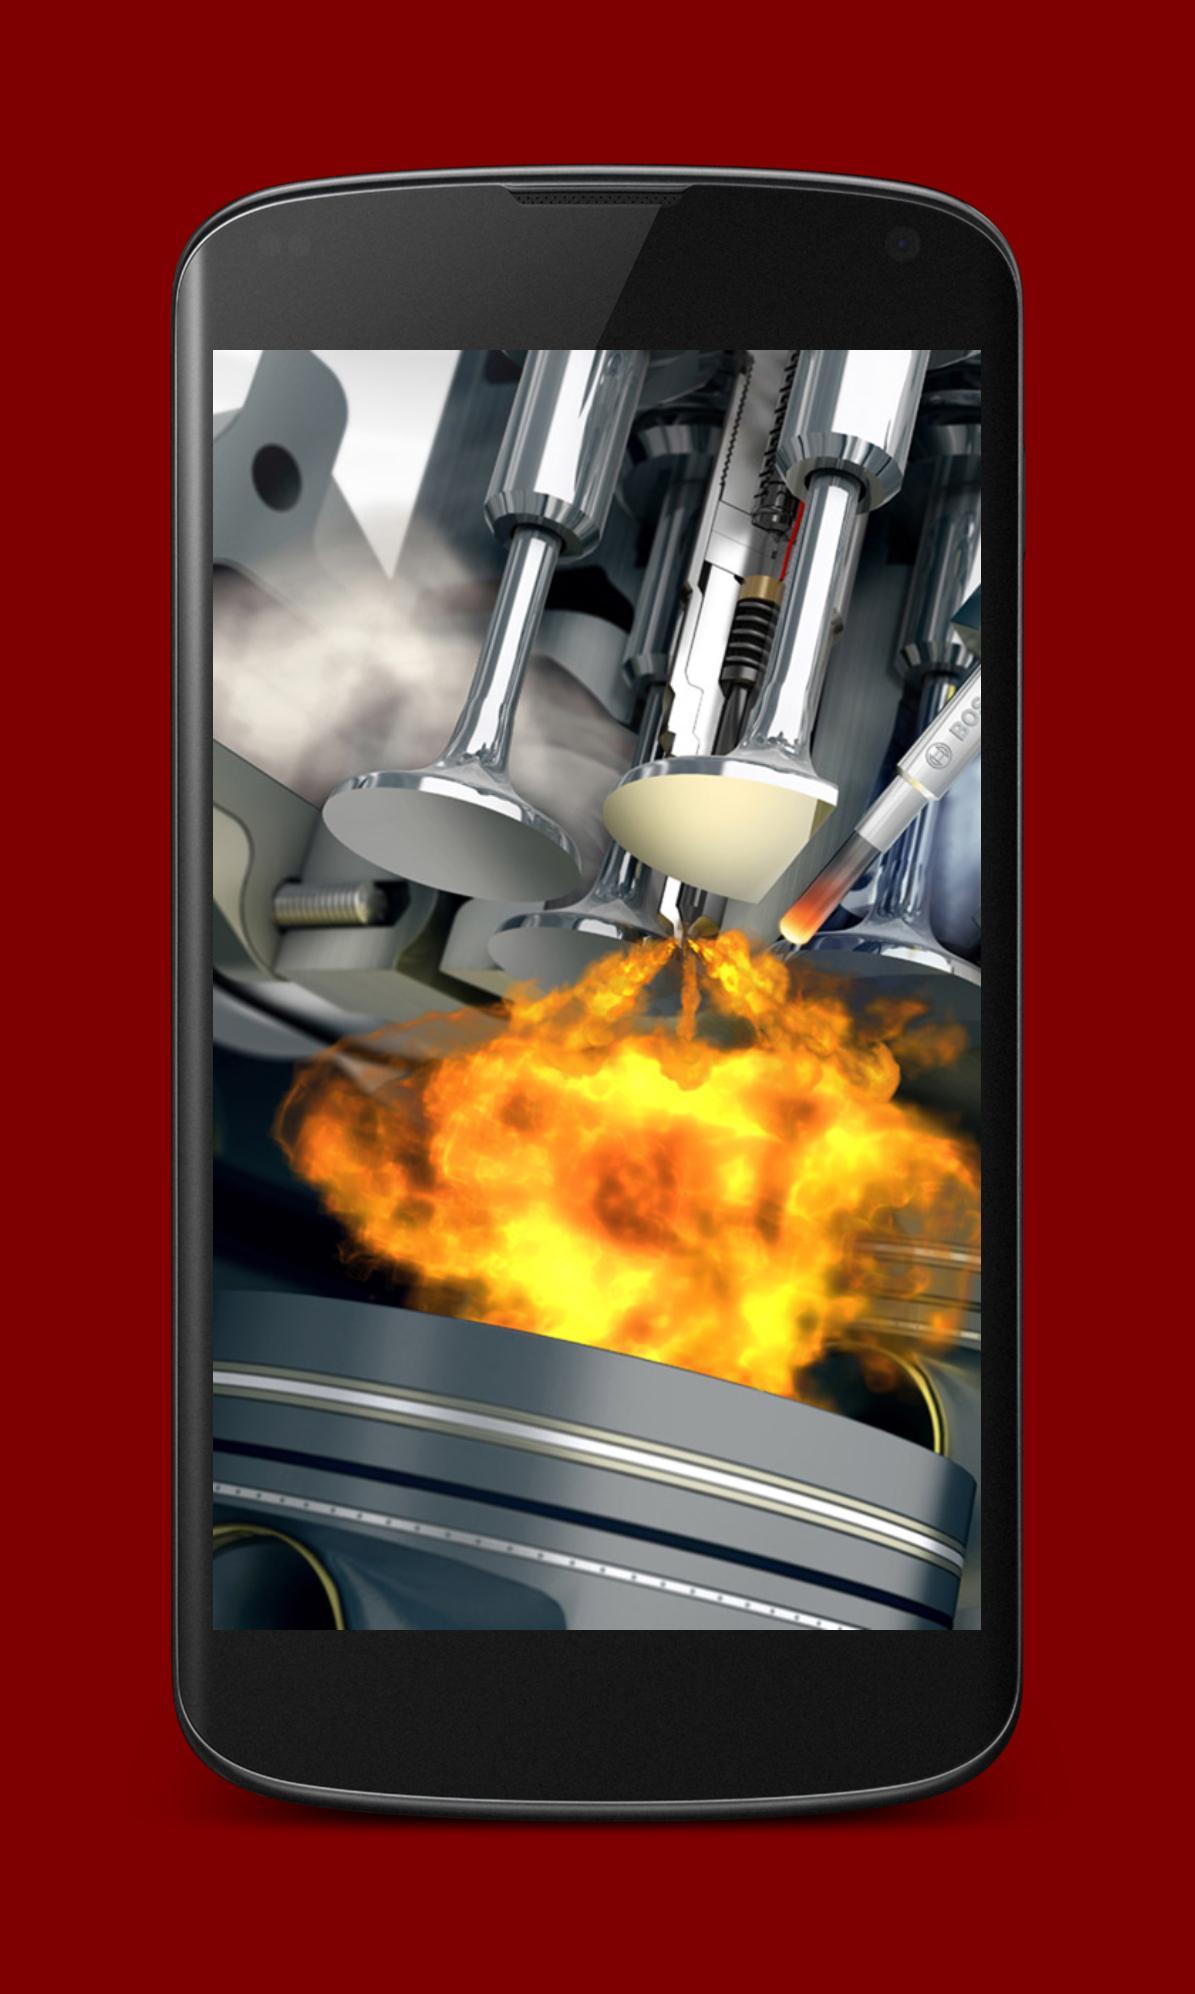 Android 用の Diesel Engine Live Wallpaper Apk をダウンロード